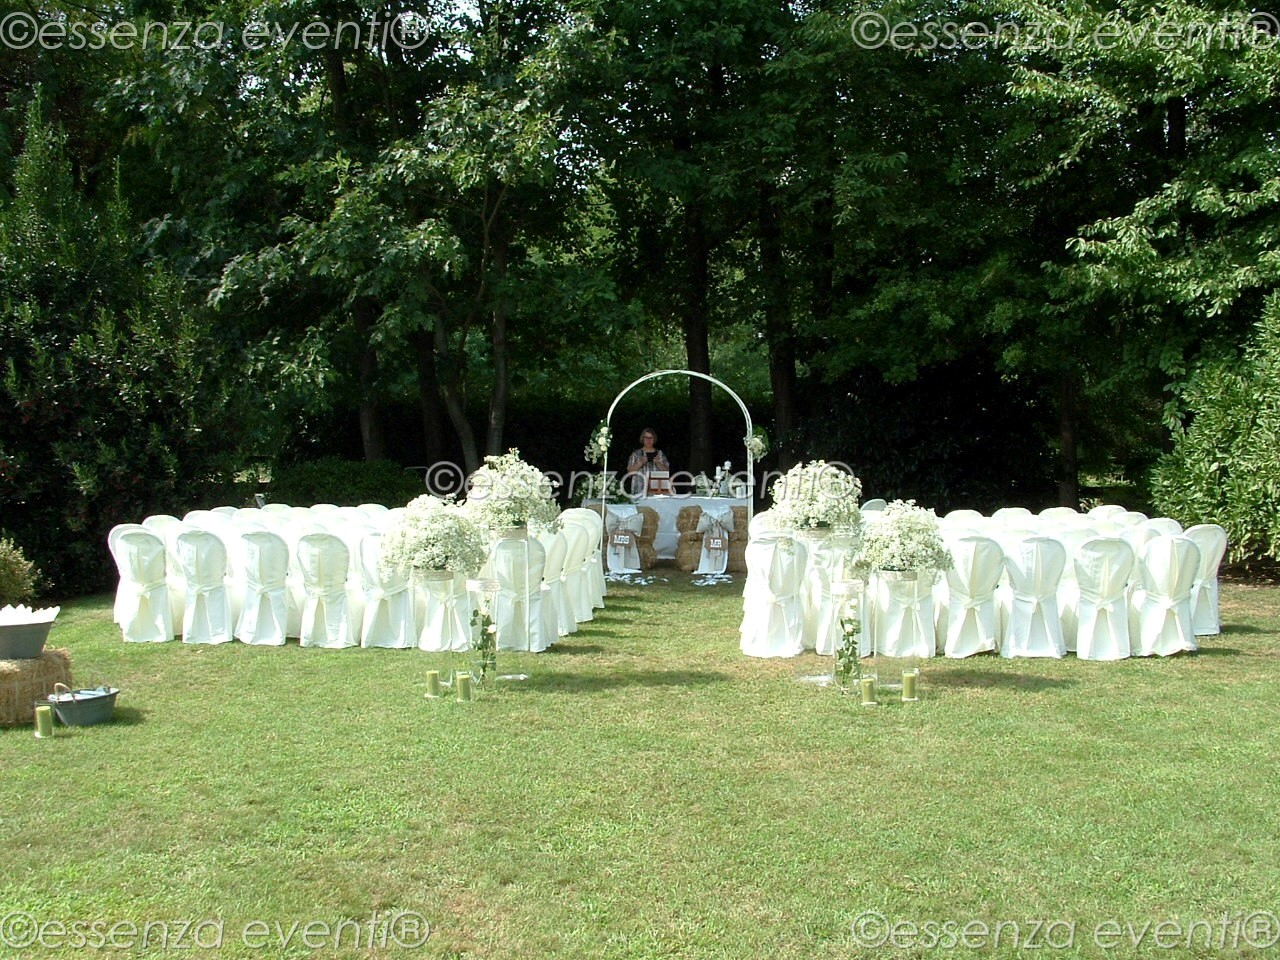 Matrimonio Simbolico Bali : Matrimonio simbolico essenza eventi